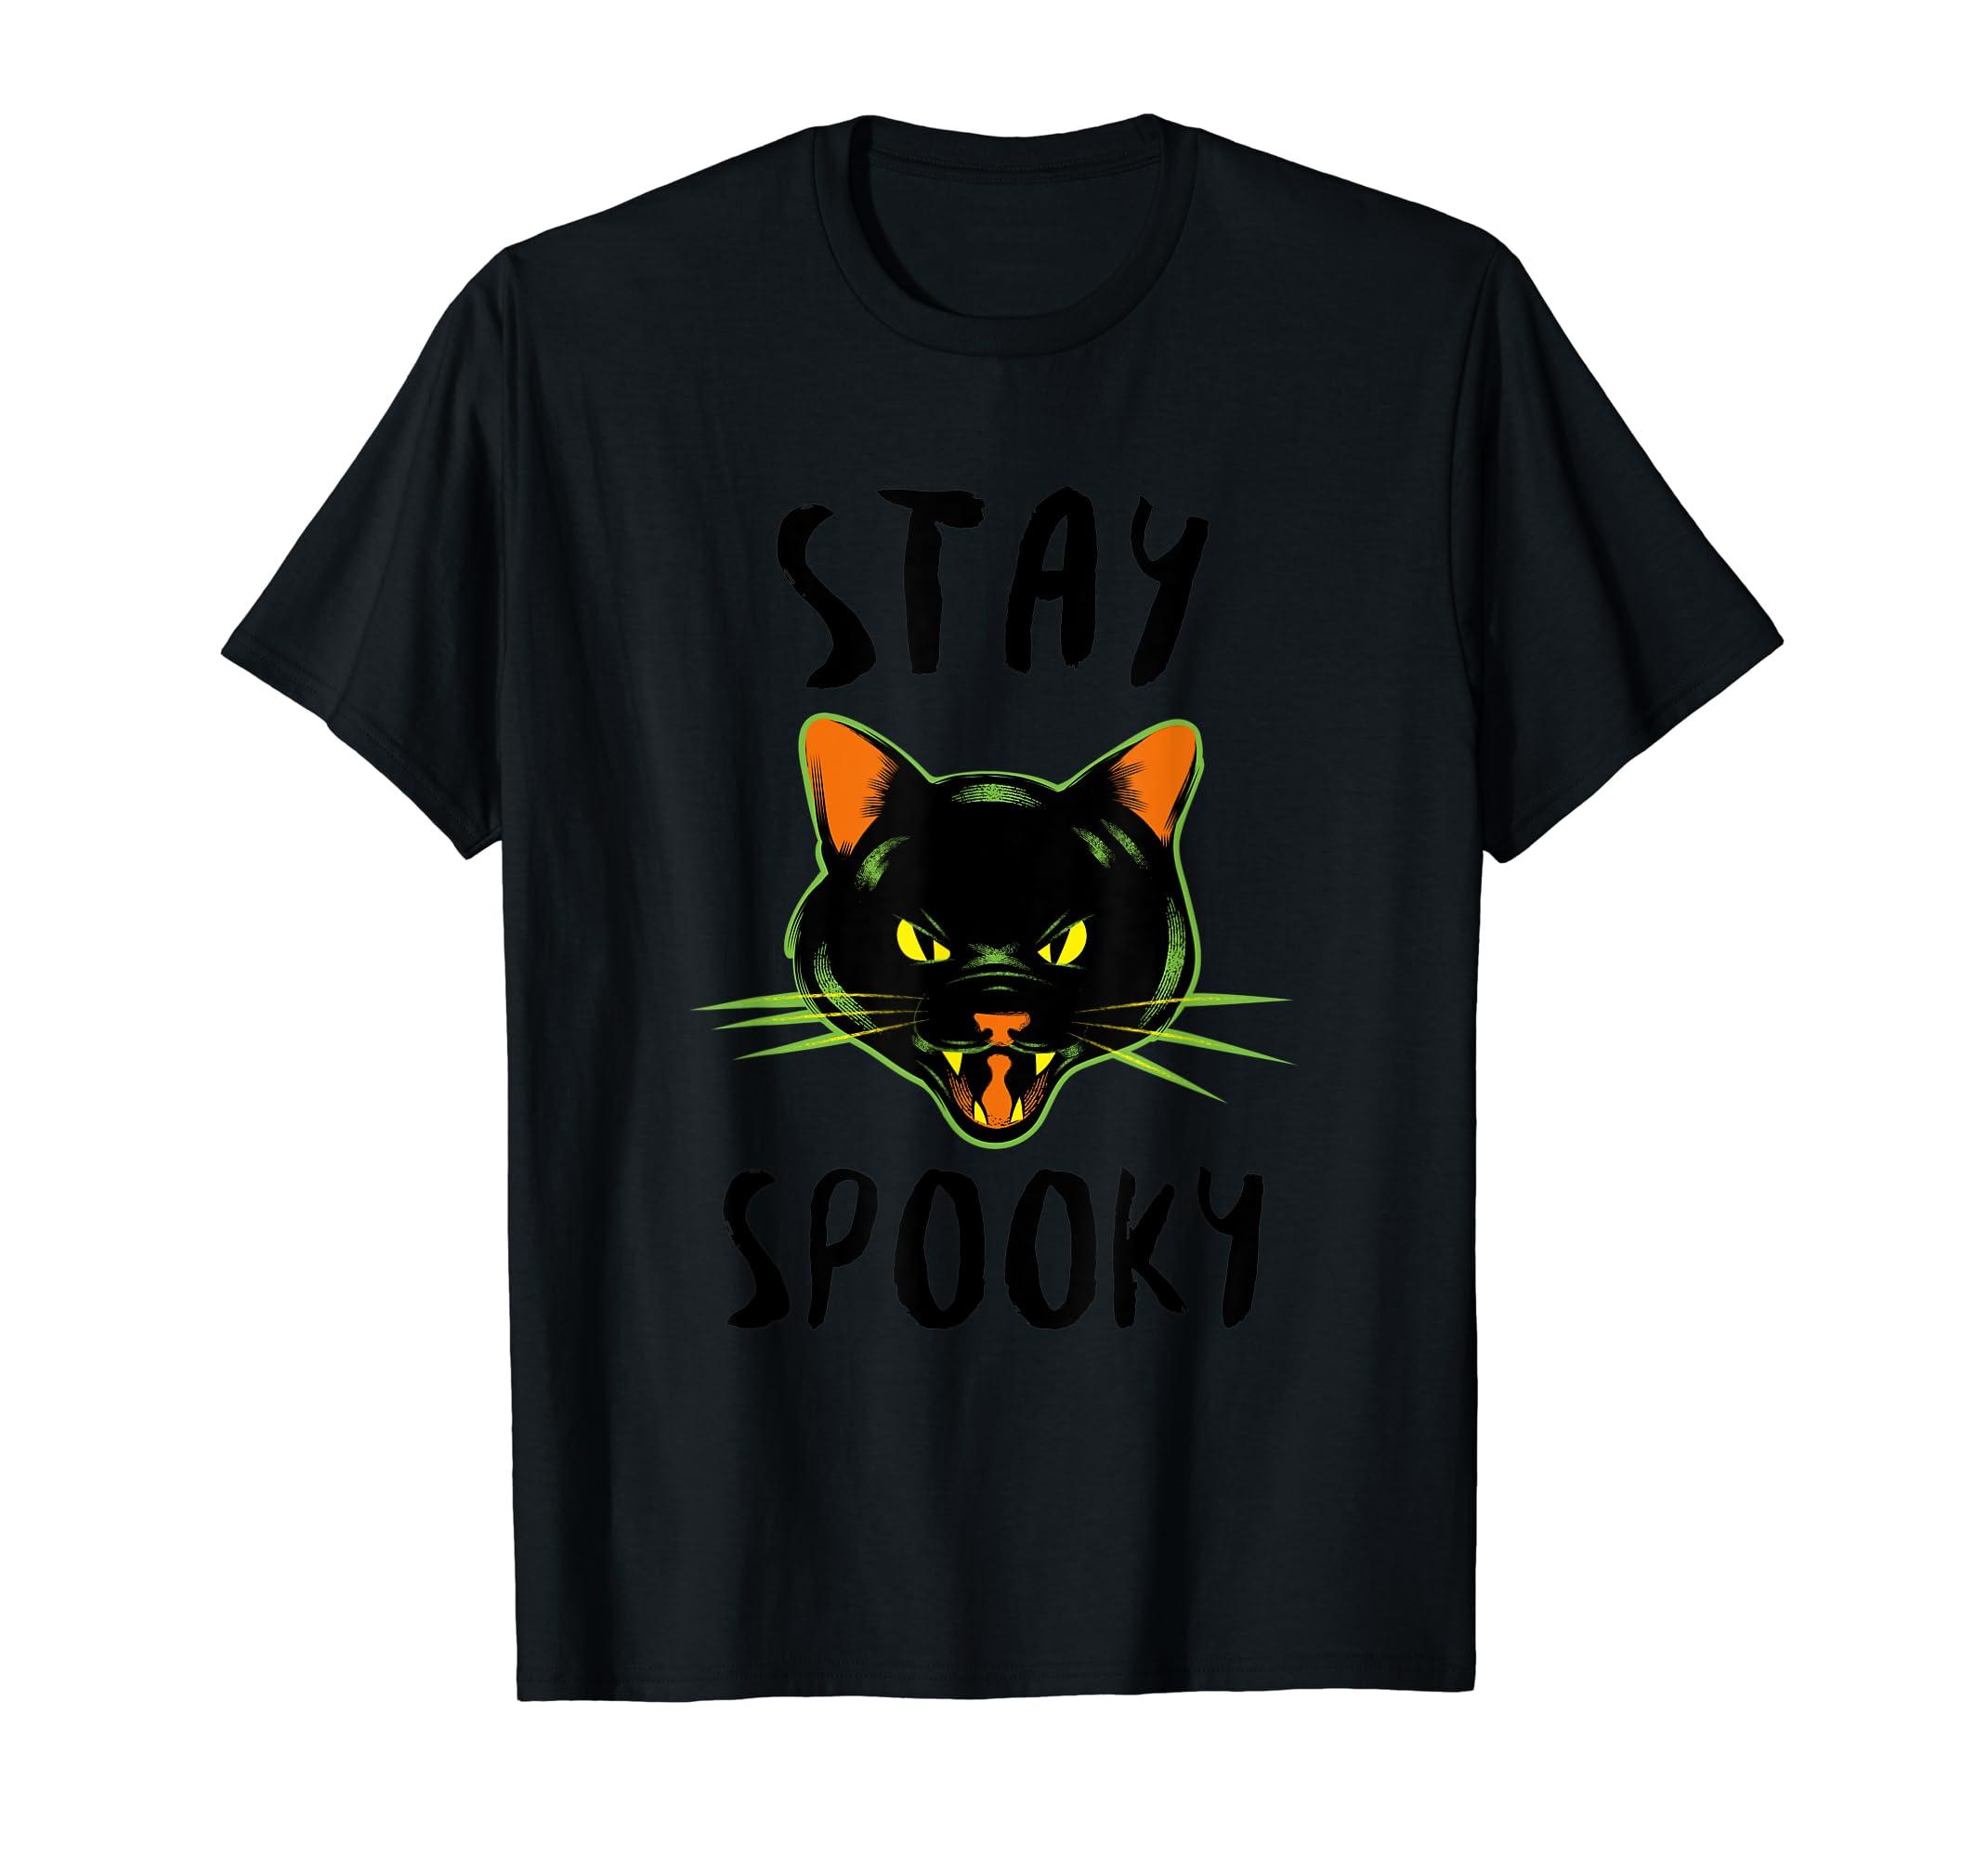 Stay Spooky | Scary Halloween Black Cat T-Shirt-Men's T-Shirt-Black